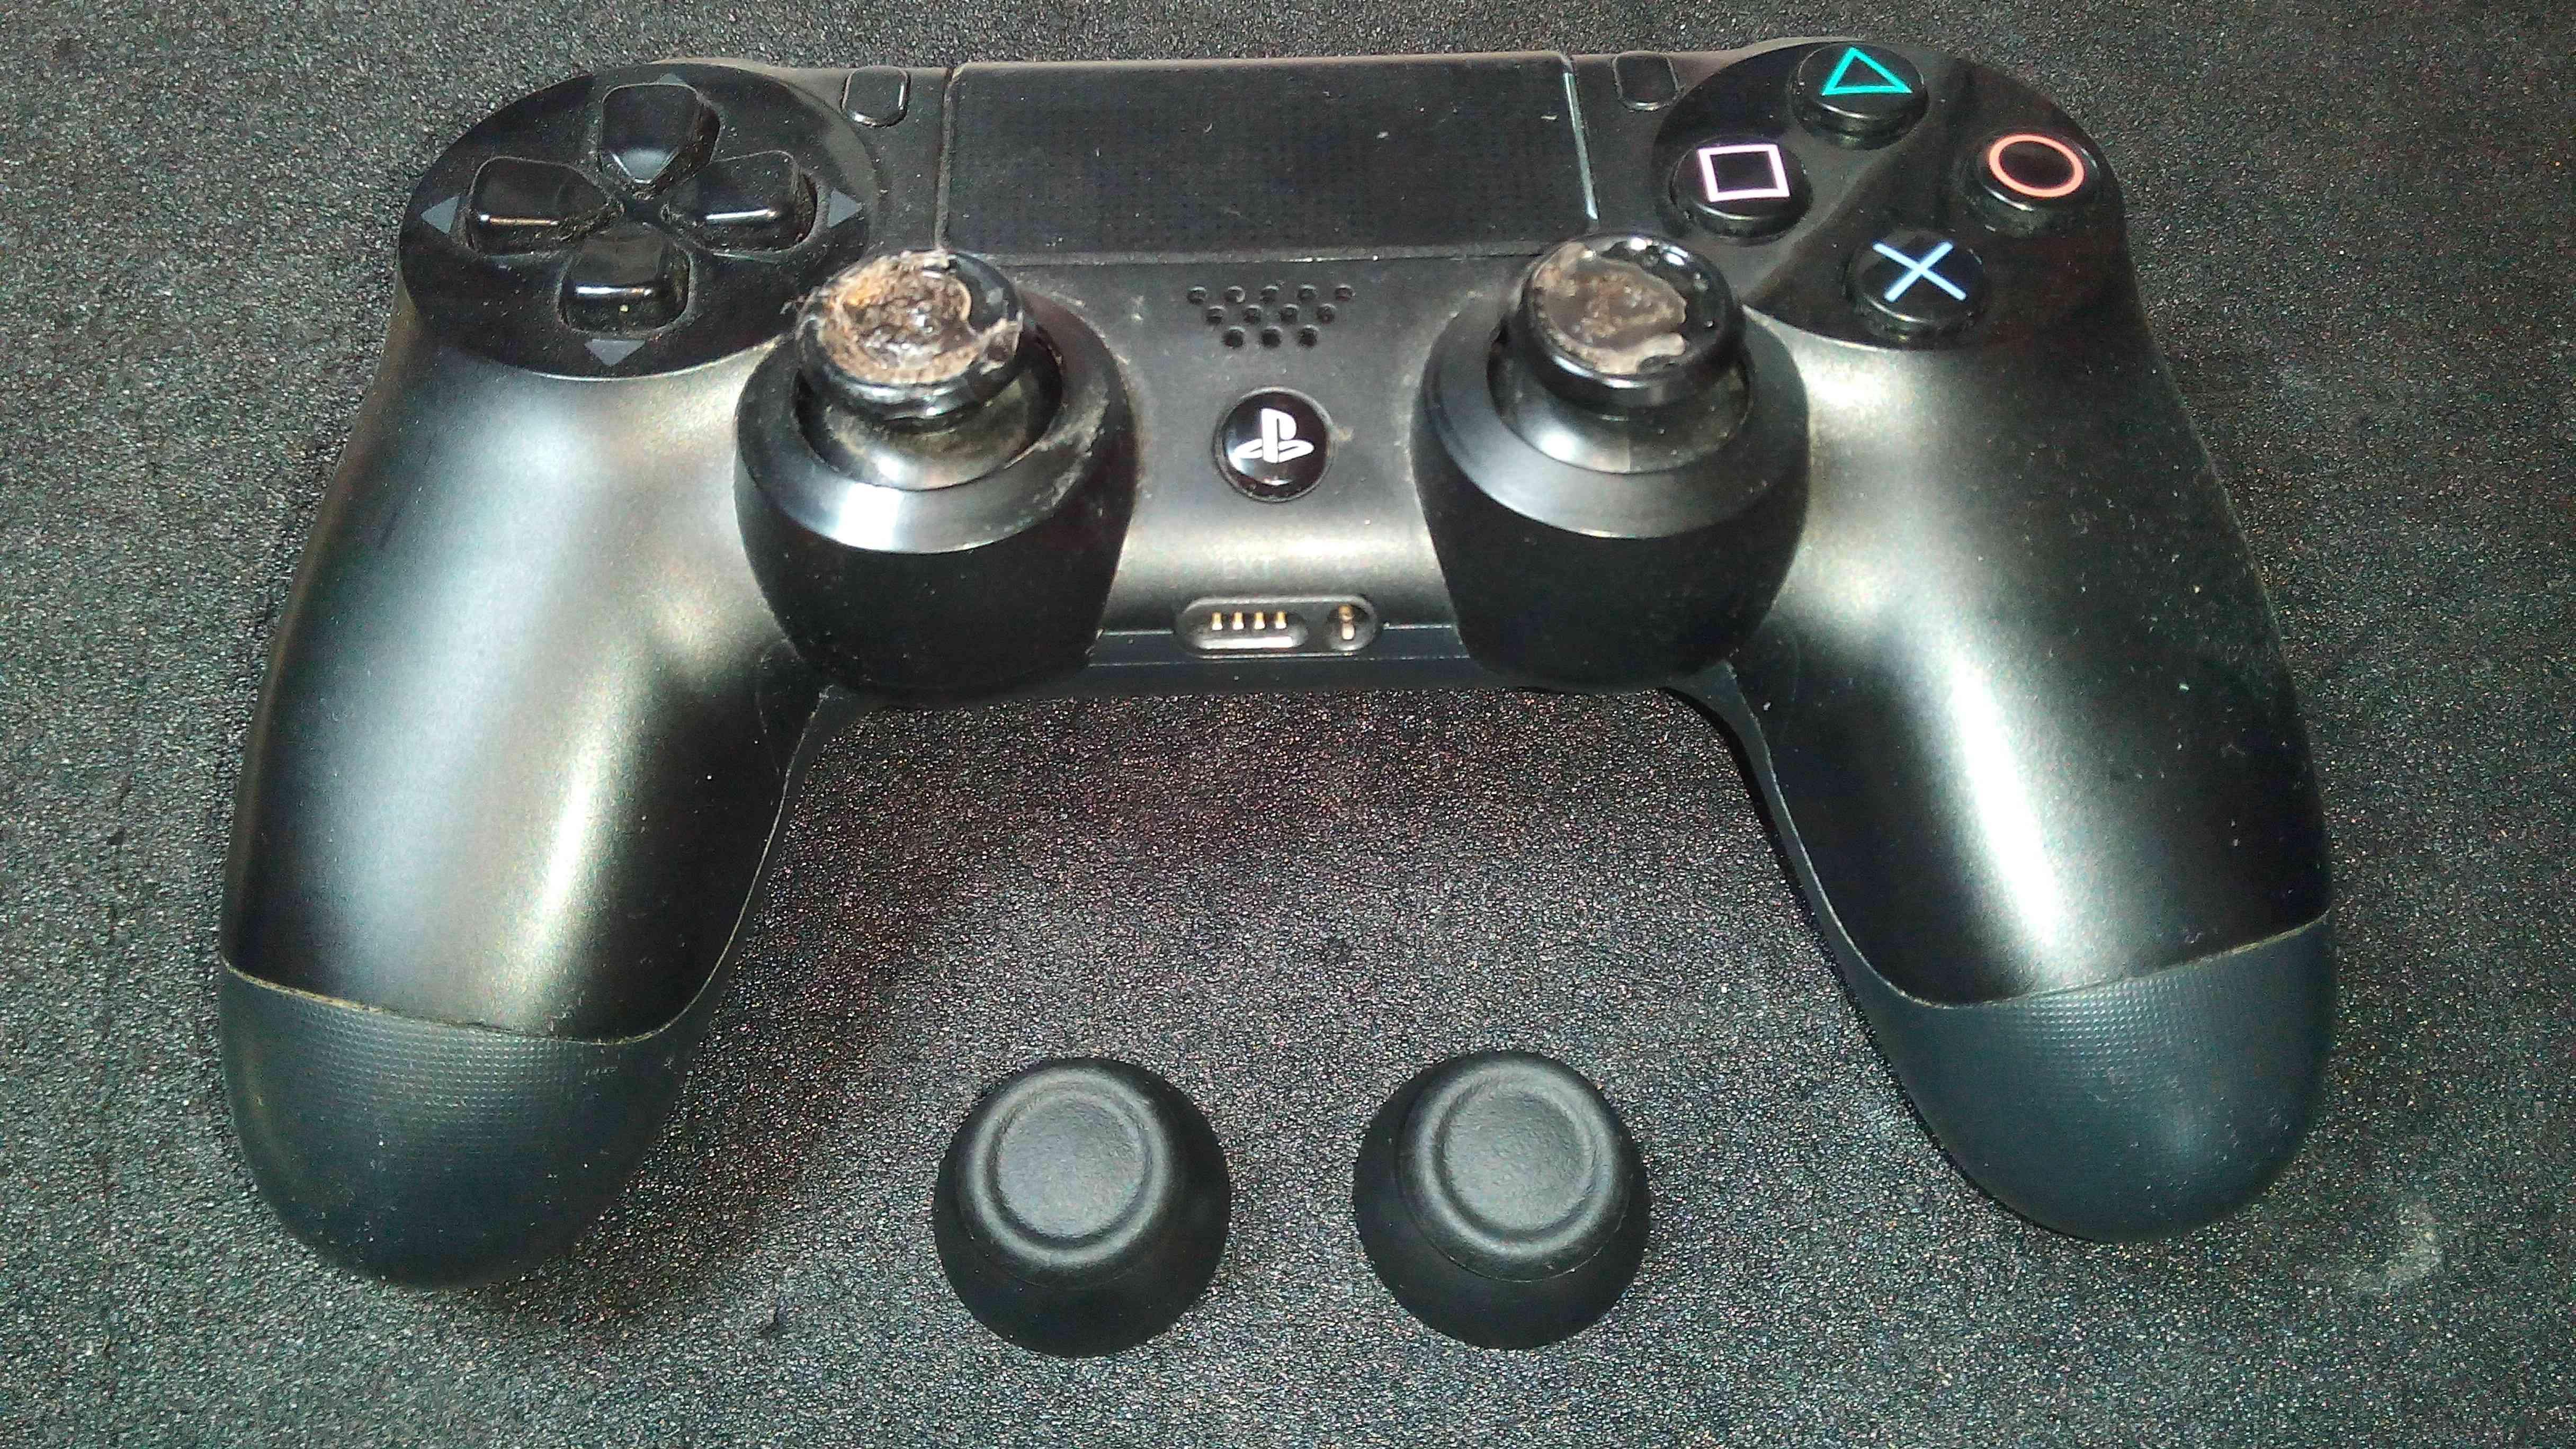 PS4 Dualshock 4 Controller Thumbsticks Verschließen Gummis eingerissen & Beschädigt? Austausch Rechts & Links Reparatur 16,00€ inklusive Versand.